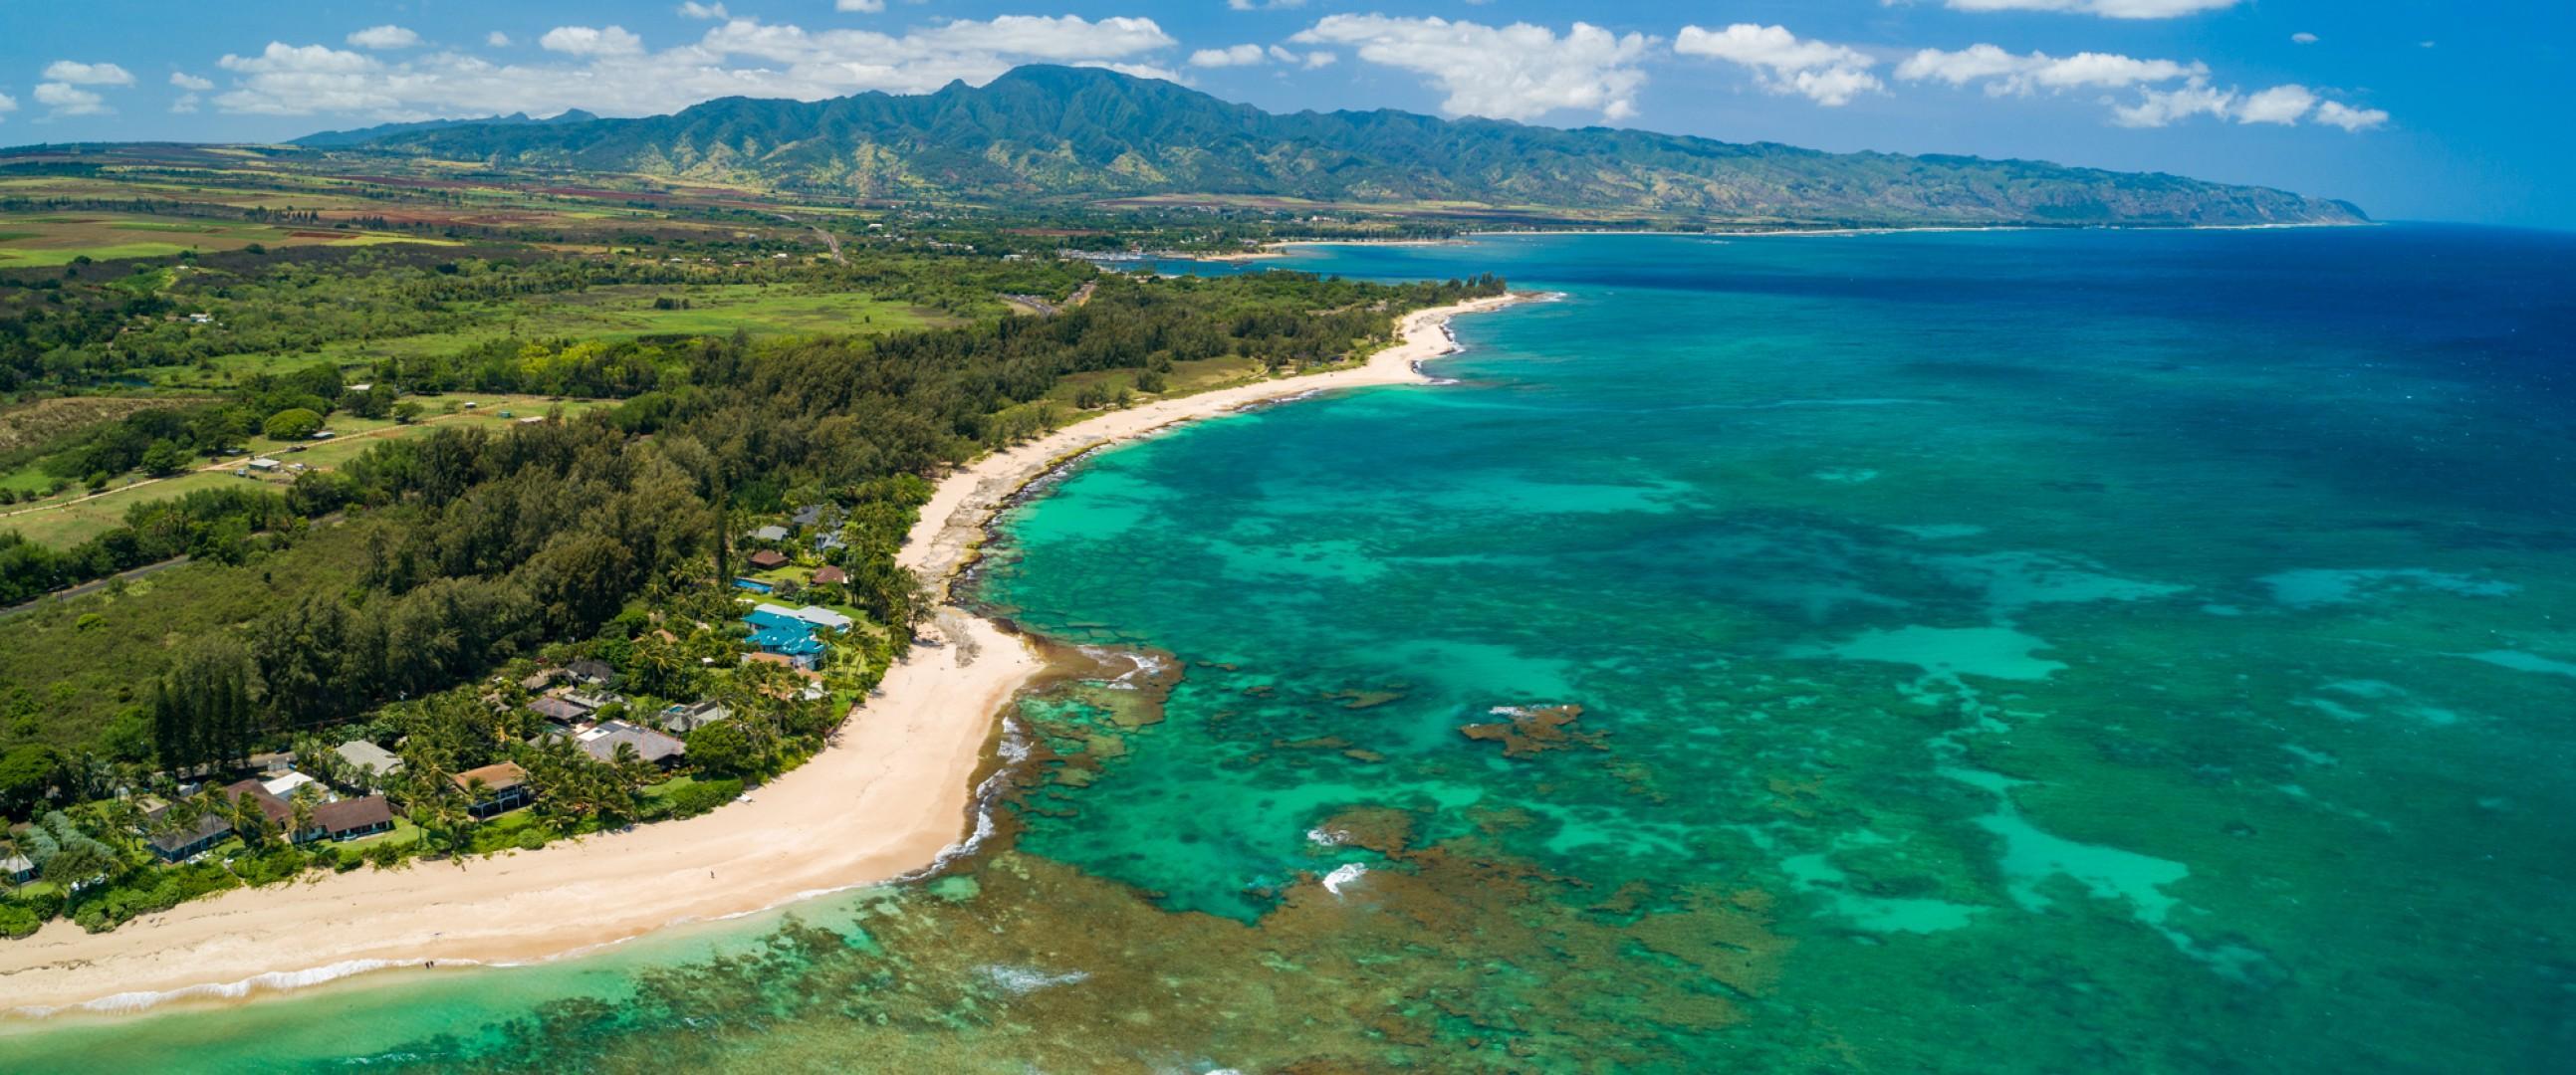 Aerial shot of Hale Komodo and Papailoa Beach